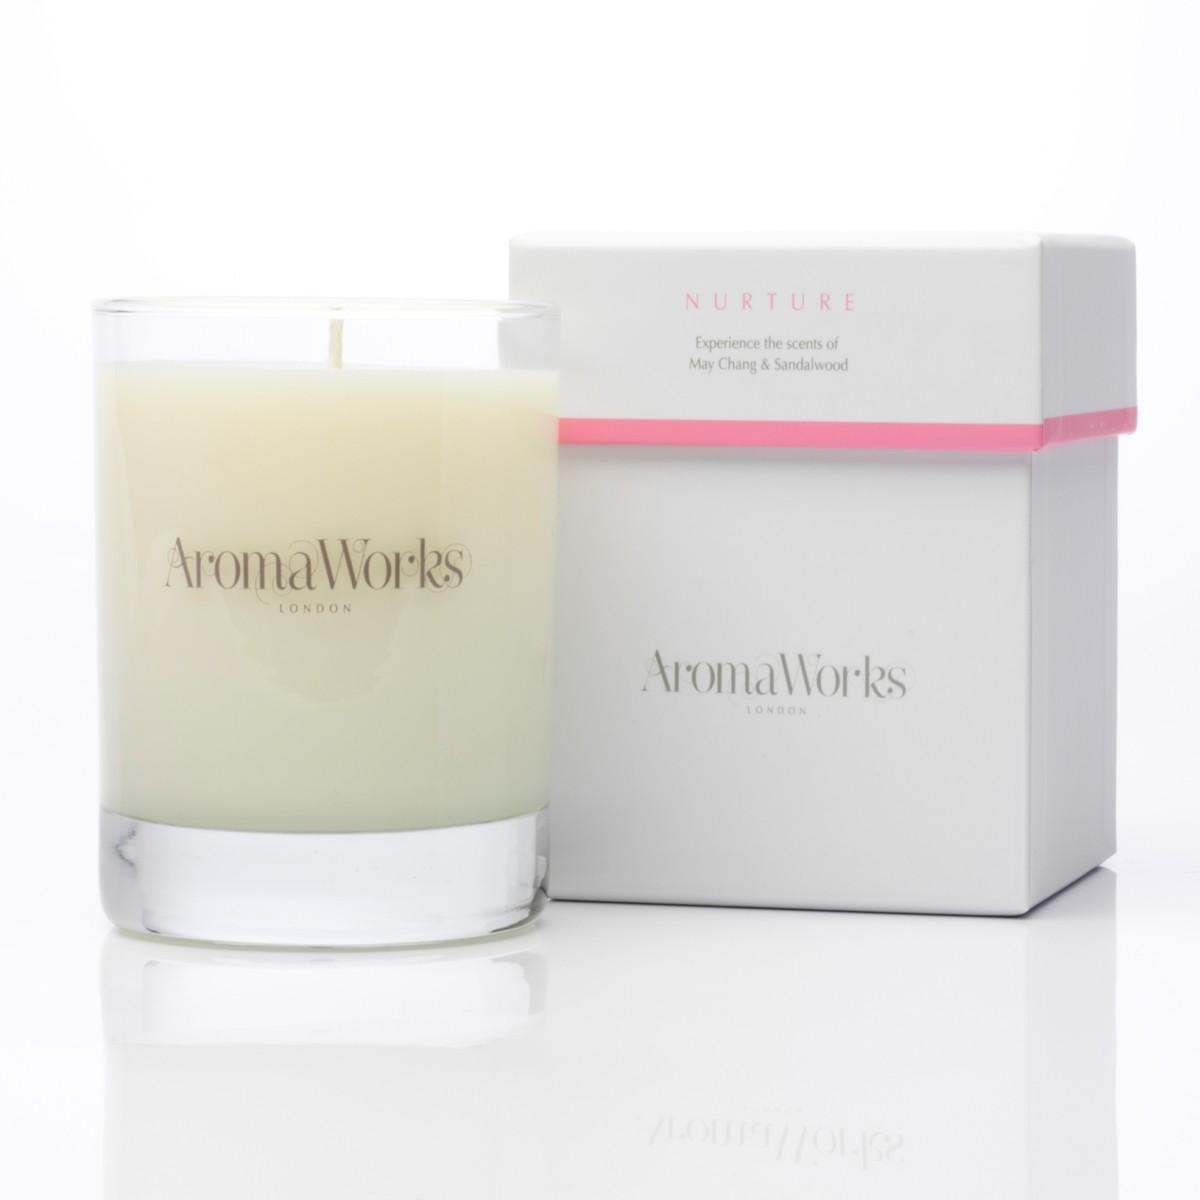 Aromaworks Nurture Candle 30 cl